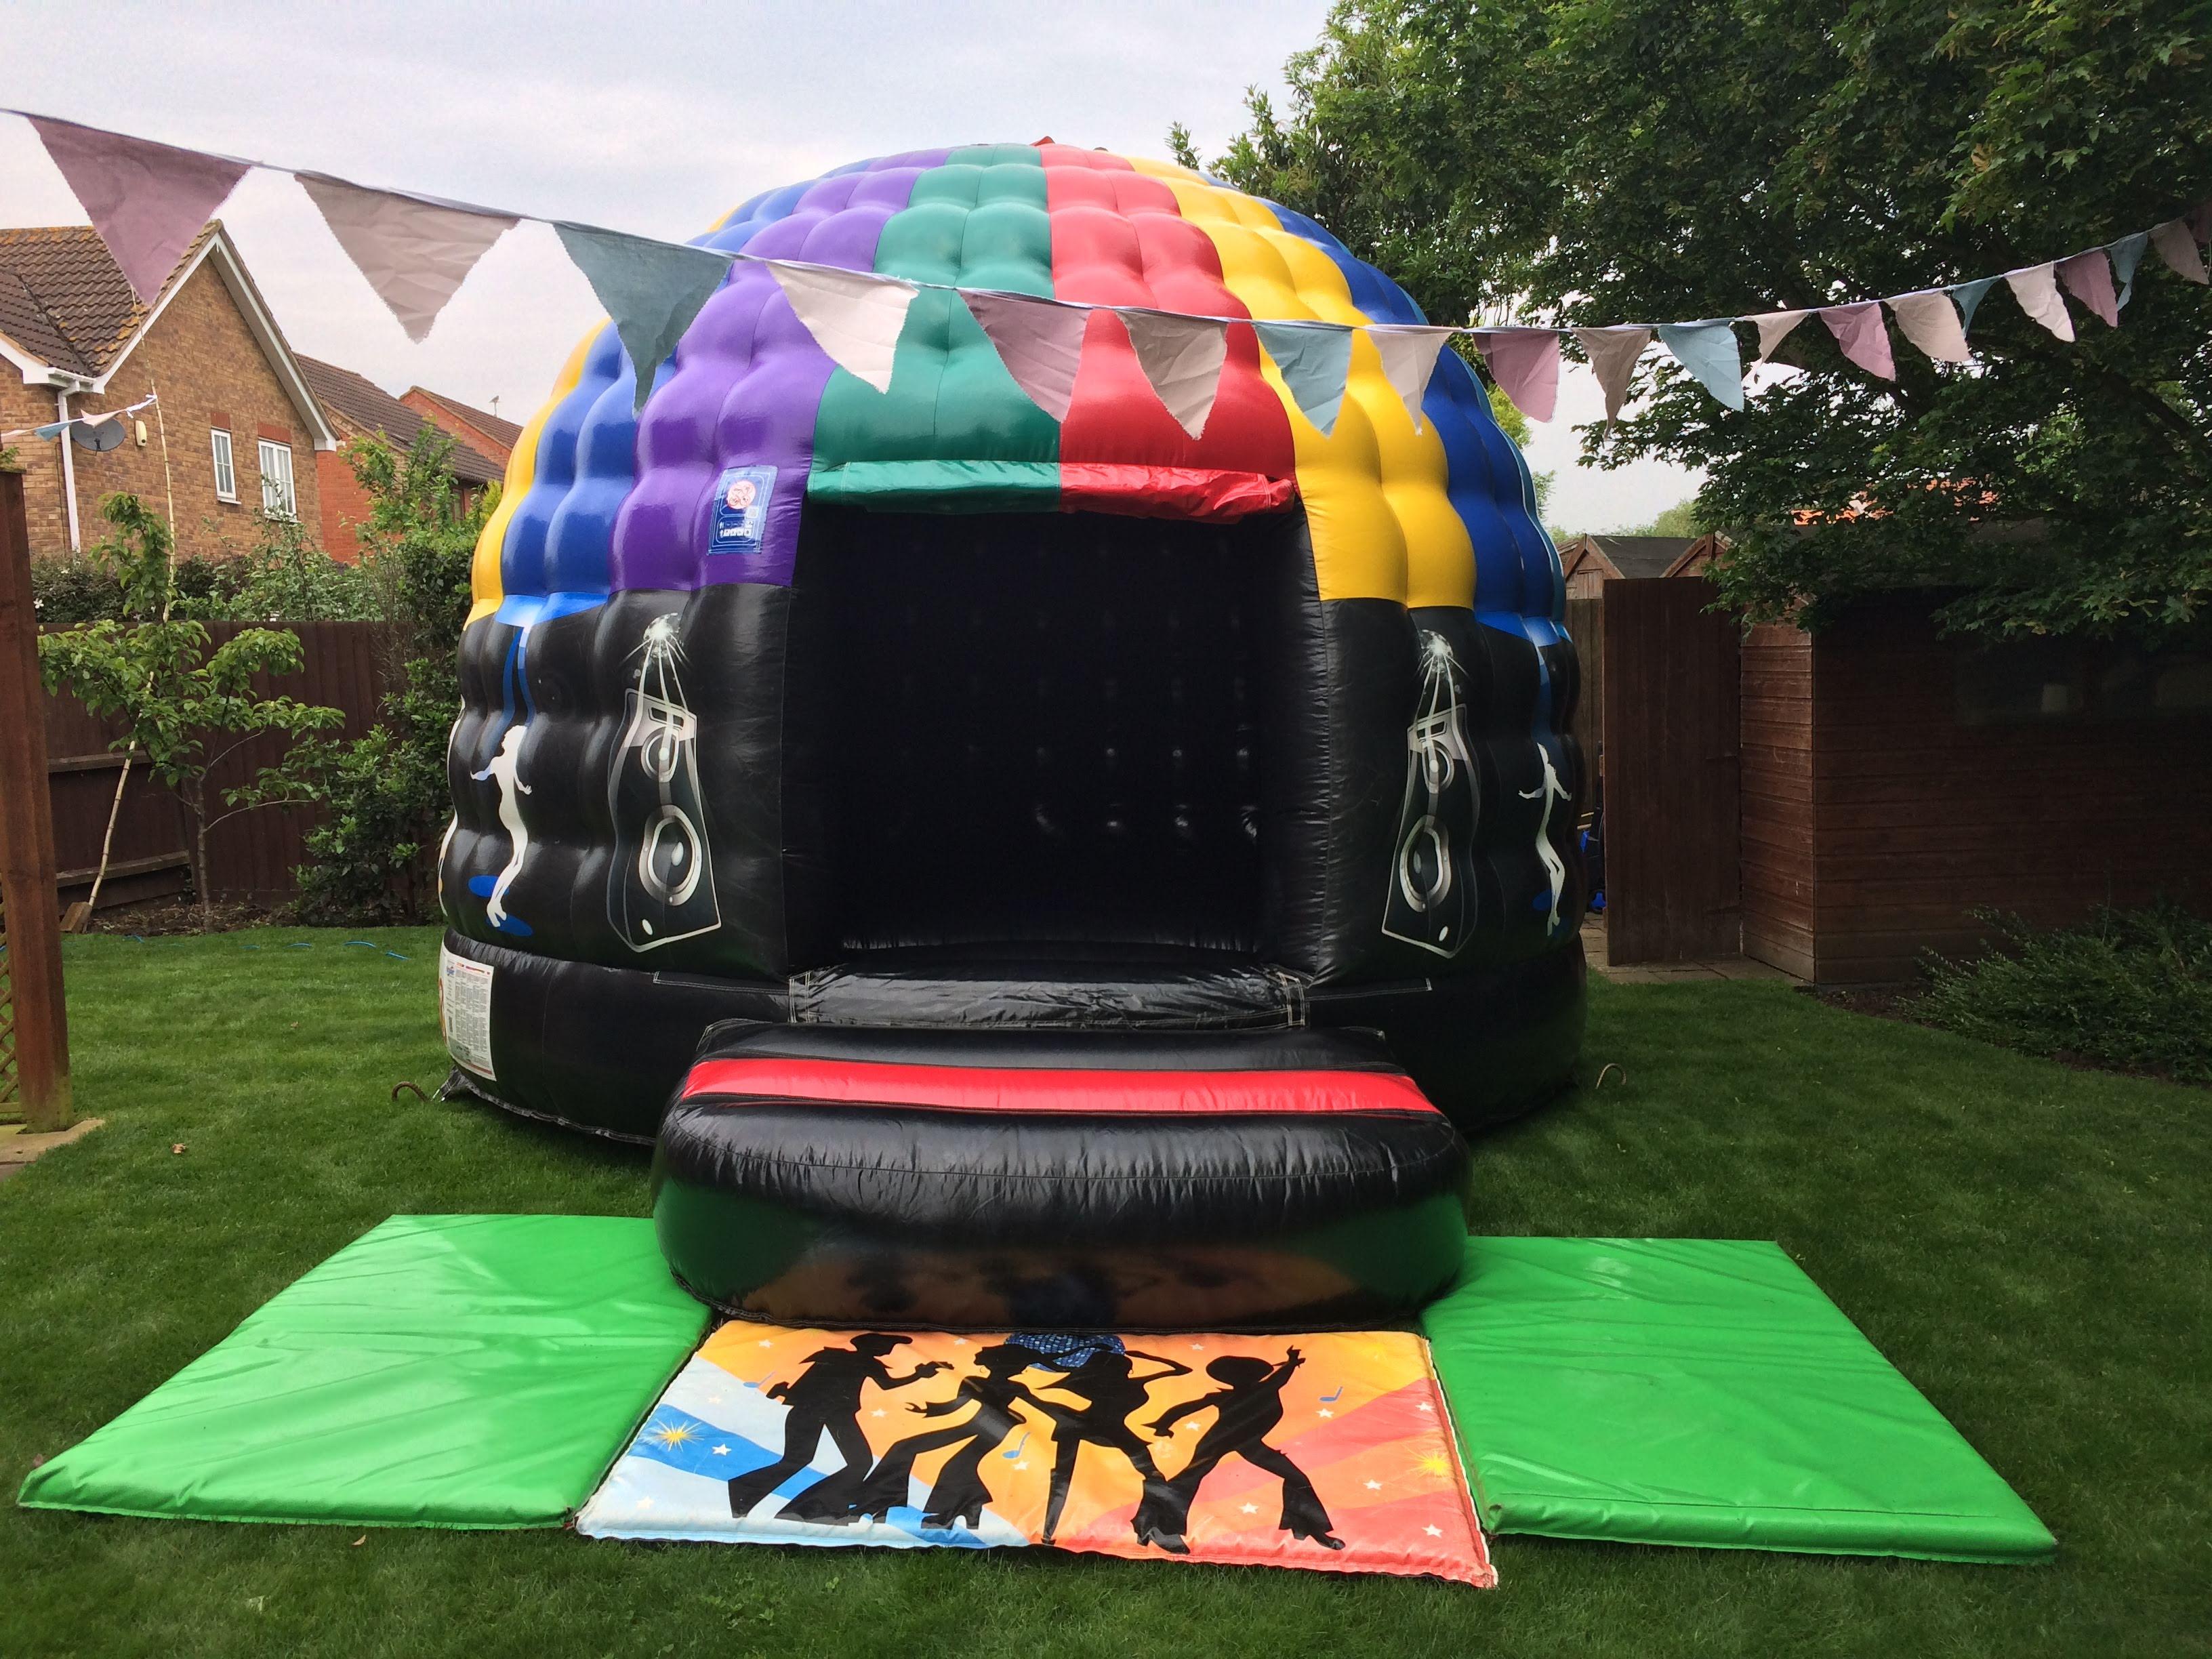 Spalding Bouncy Castles